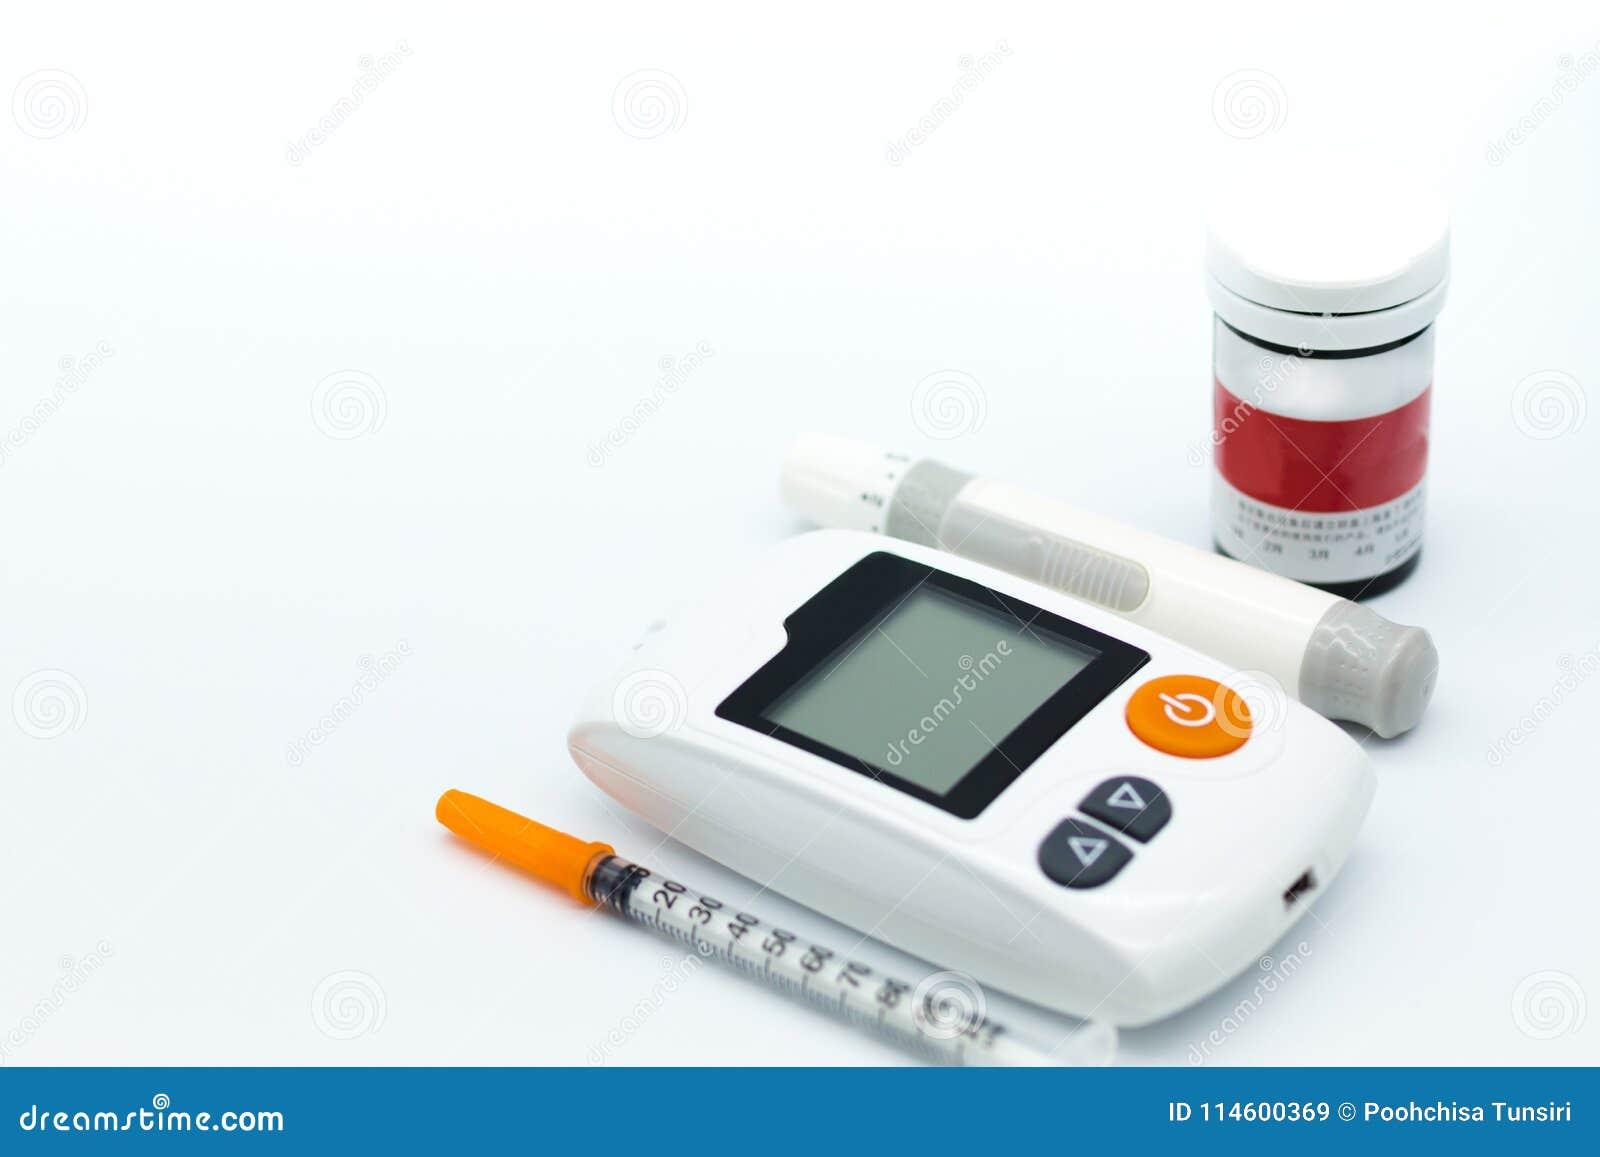 The use of glucose in medicine 98